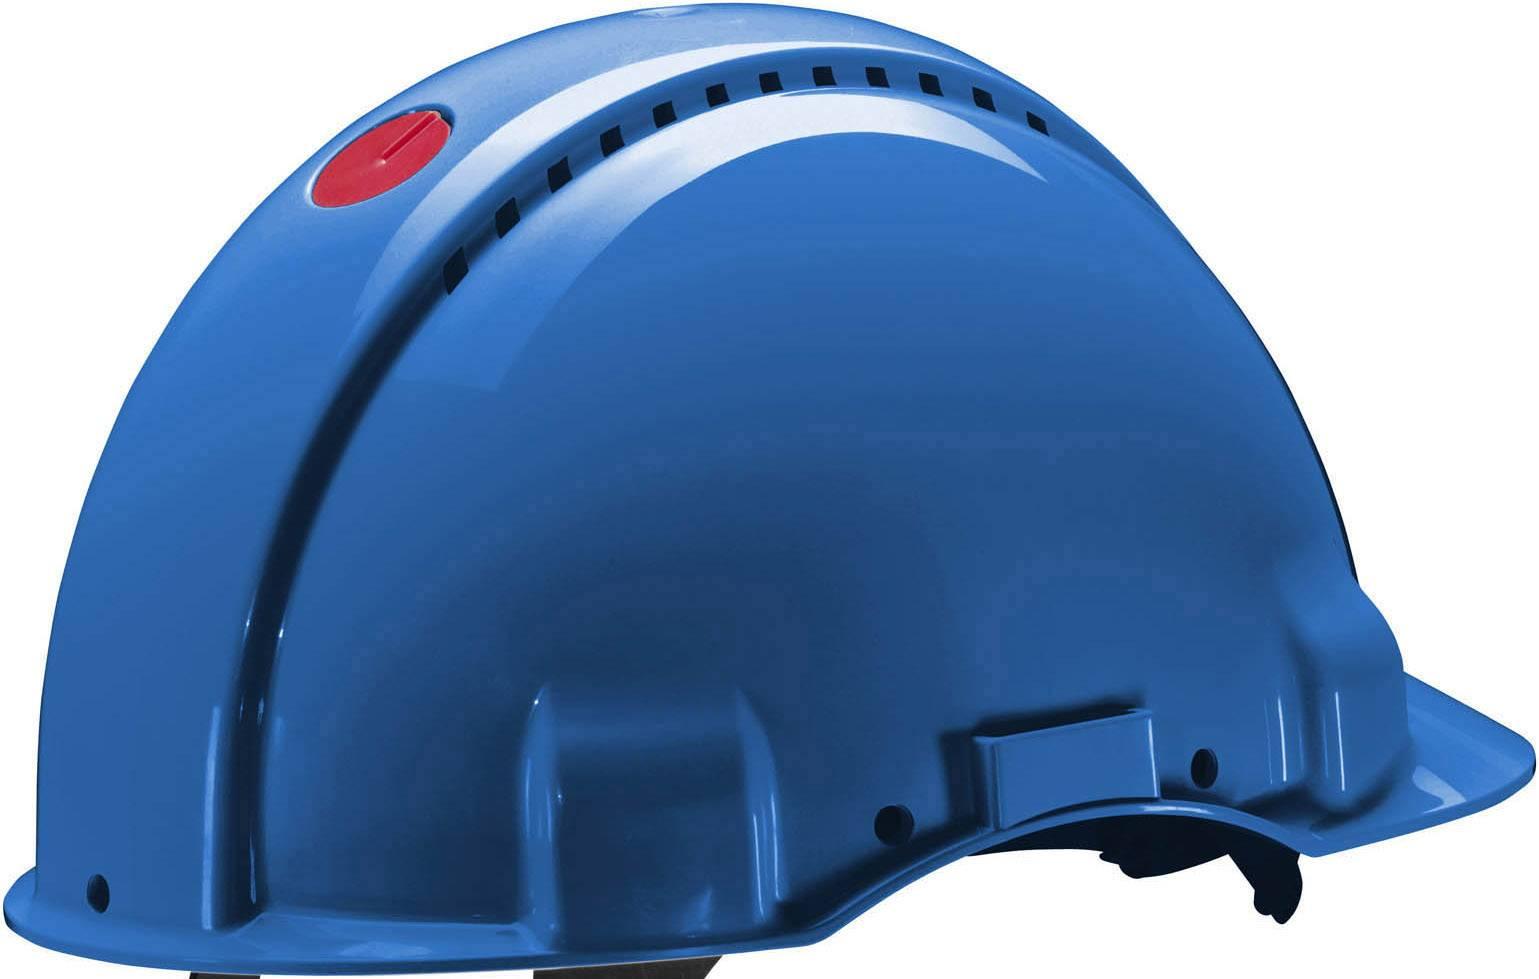 3M G3000 Safety Helmet